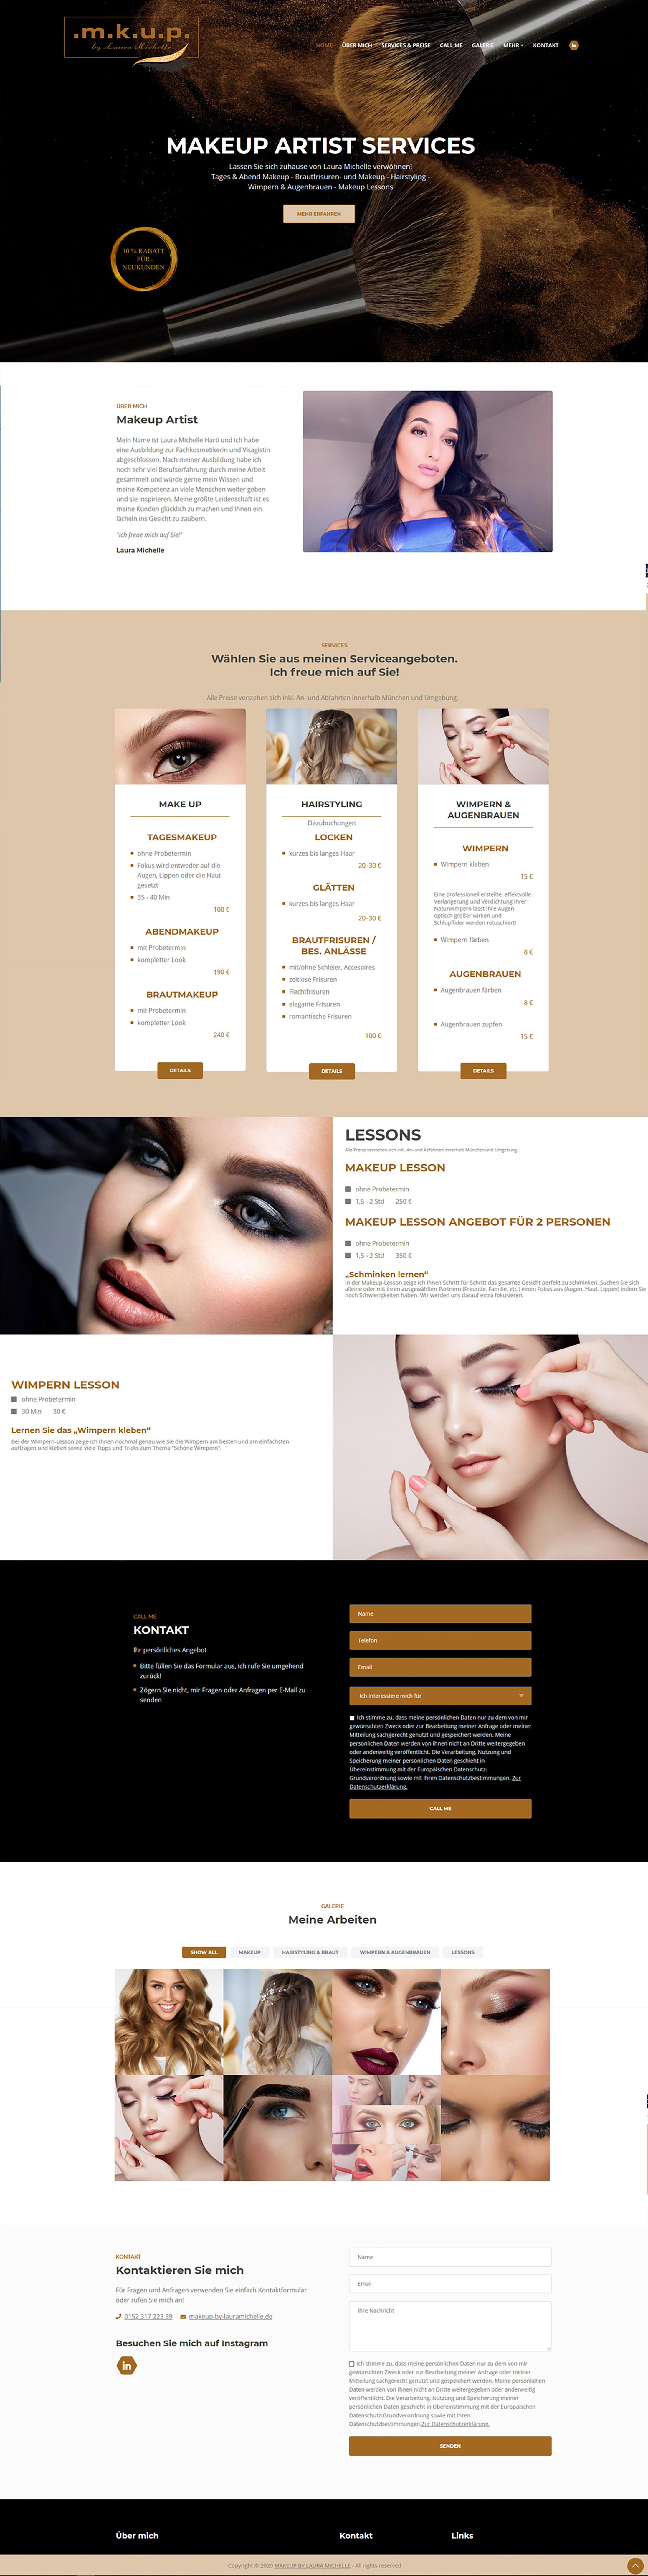 Projekt Visagistin-design-meets-web-web-grafik-print-werbetechnik-muenchen-markt-schwaben